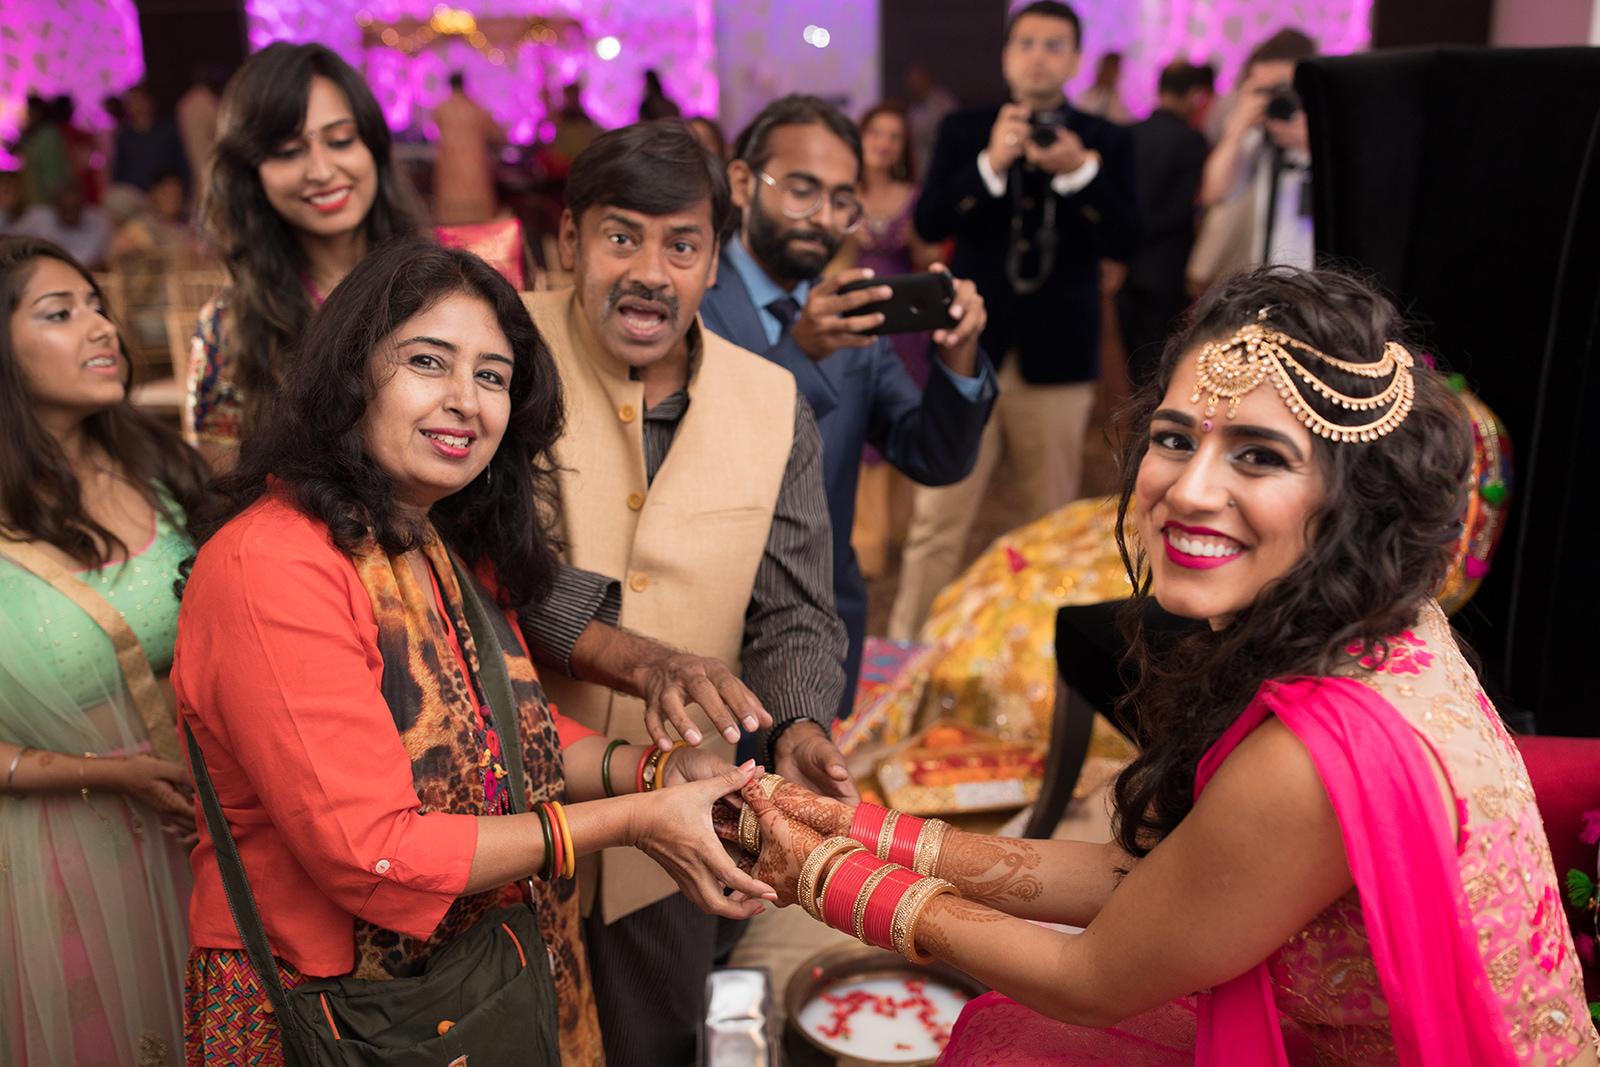 Le Cape Weddings - Sumeet and Chavi - Sangeet --73.jpg